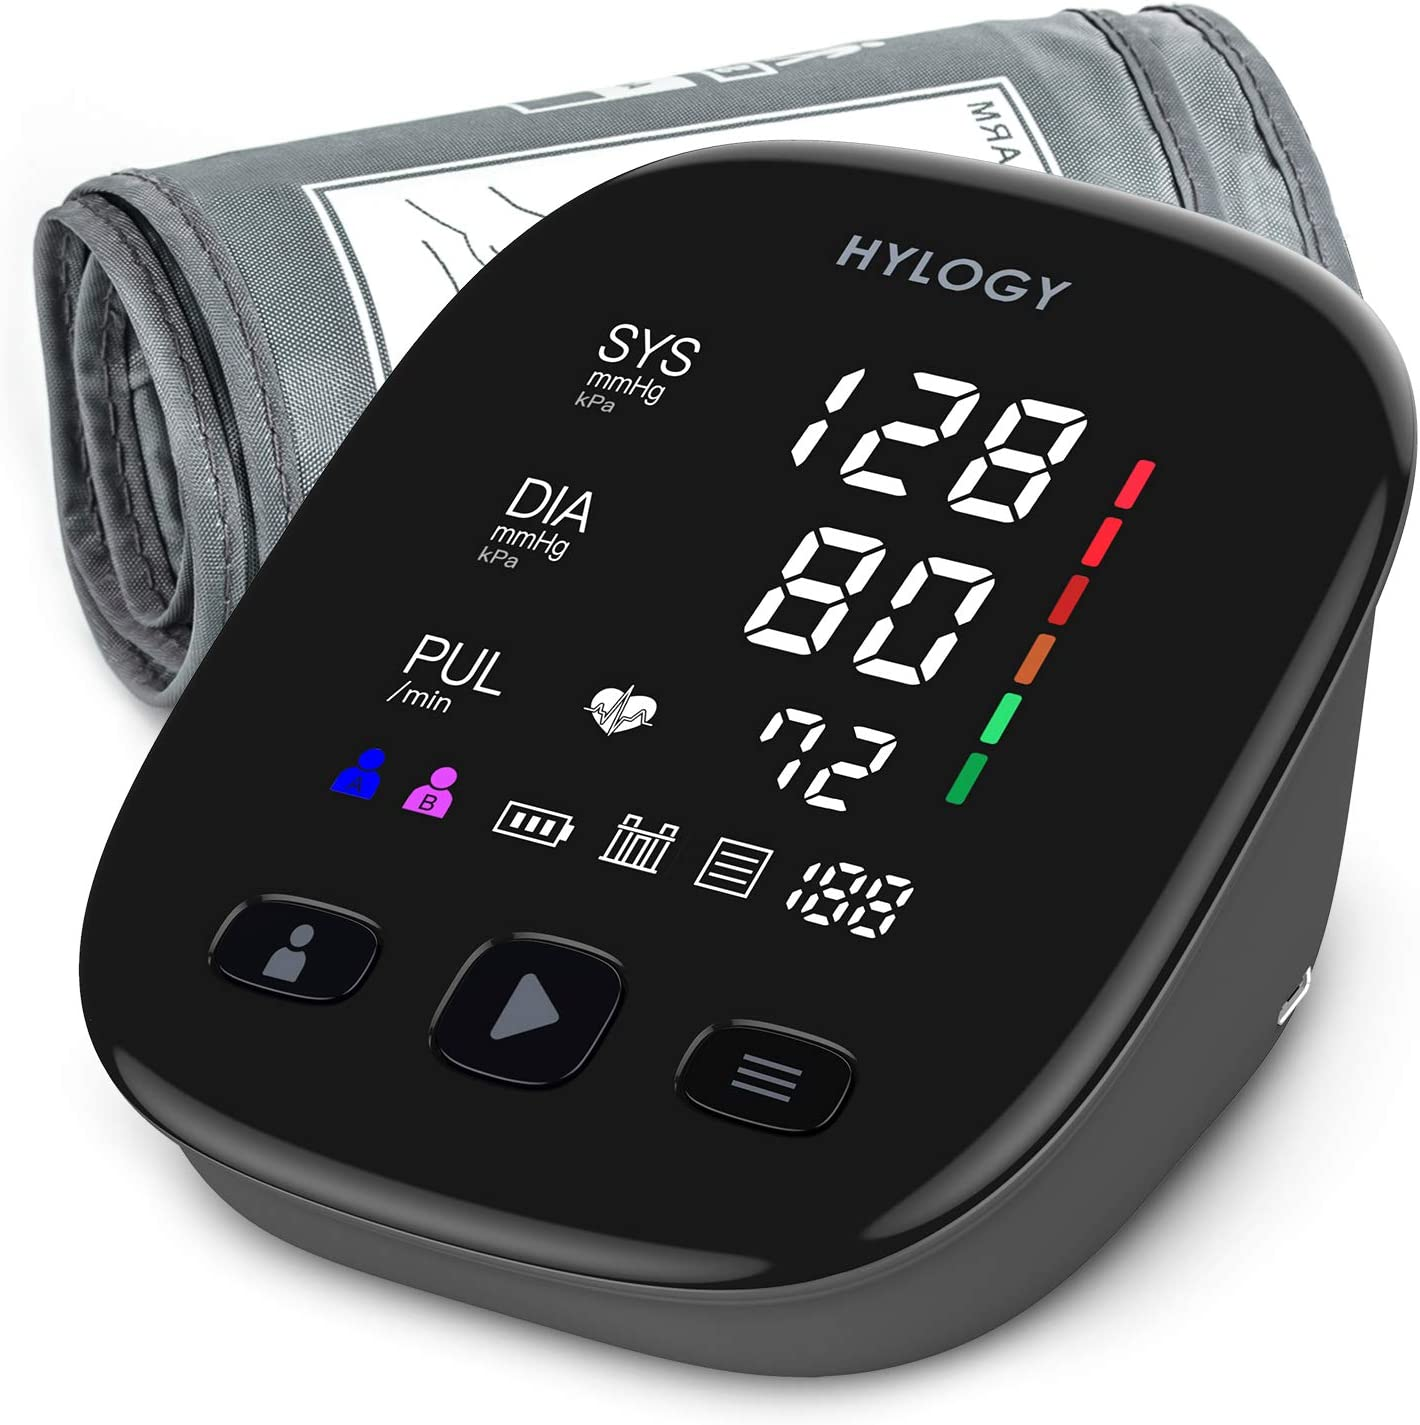 HYLOGY Tensiómetro de Brazo, Monitor de Presión Arterial Digital Automatico con Gran Pantalla LED, Deteccion de Irregular Arritmia, Brazalete 22-42cm, 2x90 Memoria y USB